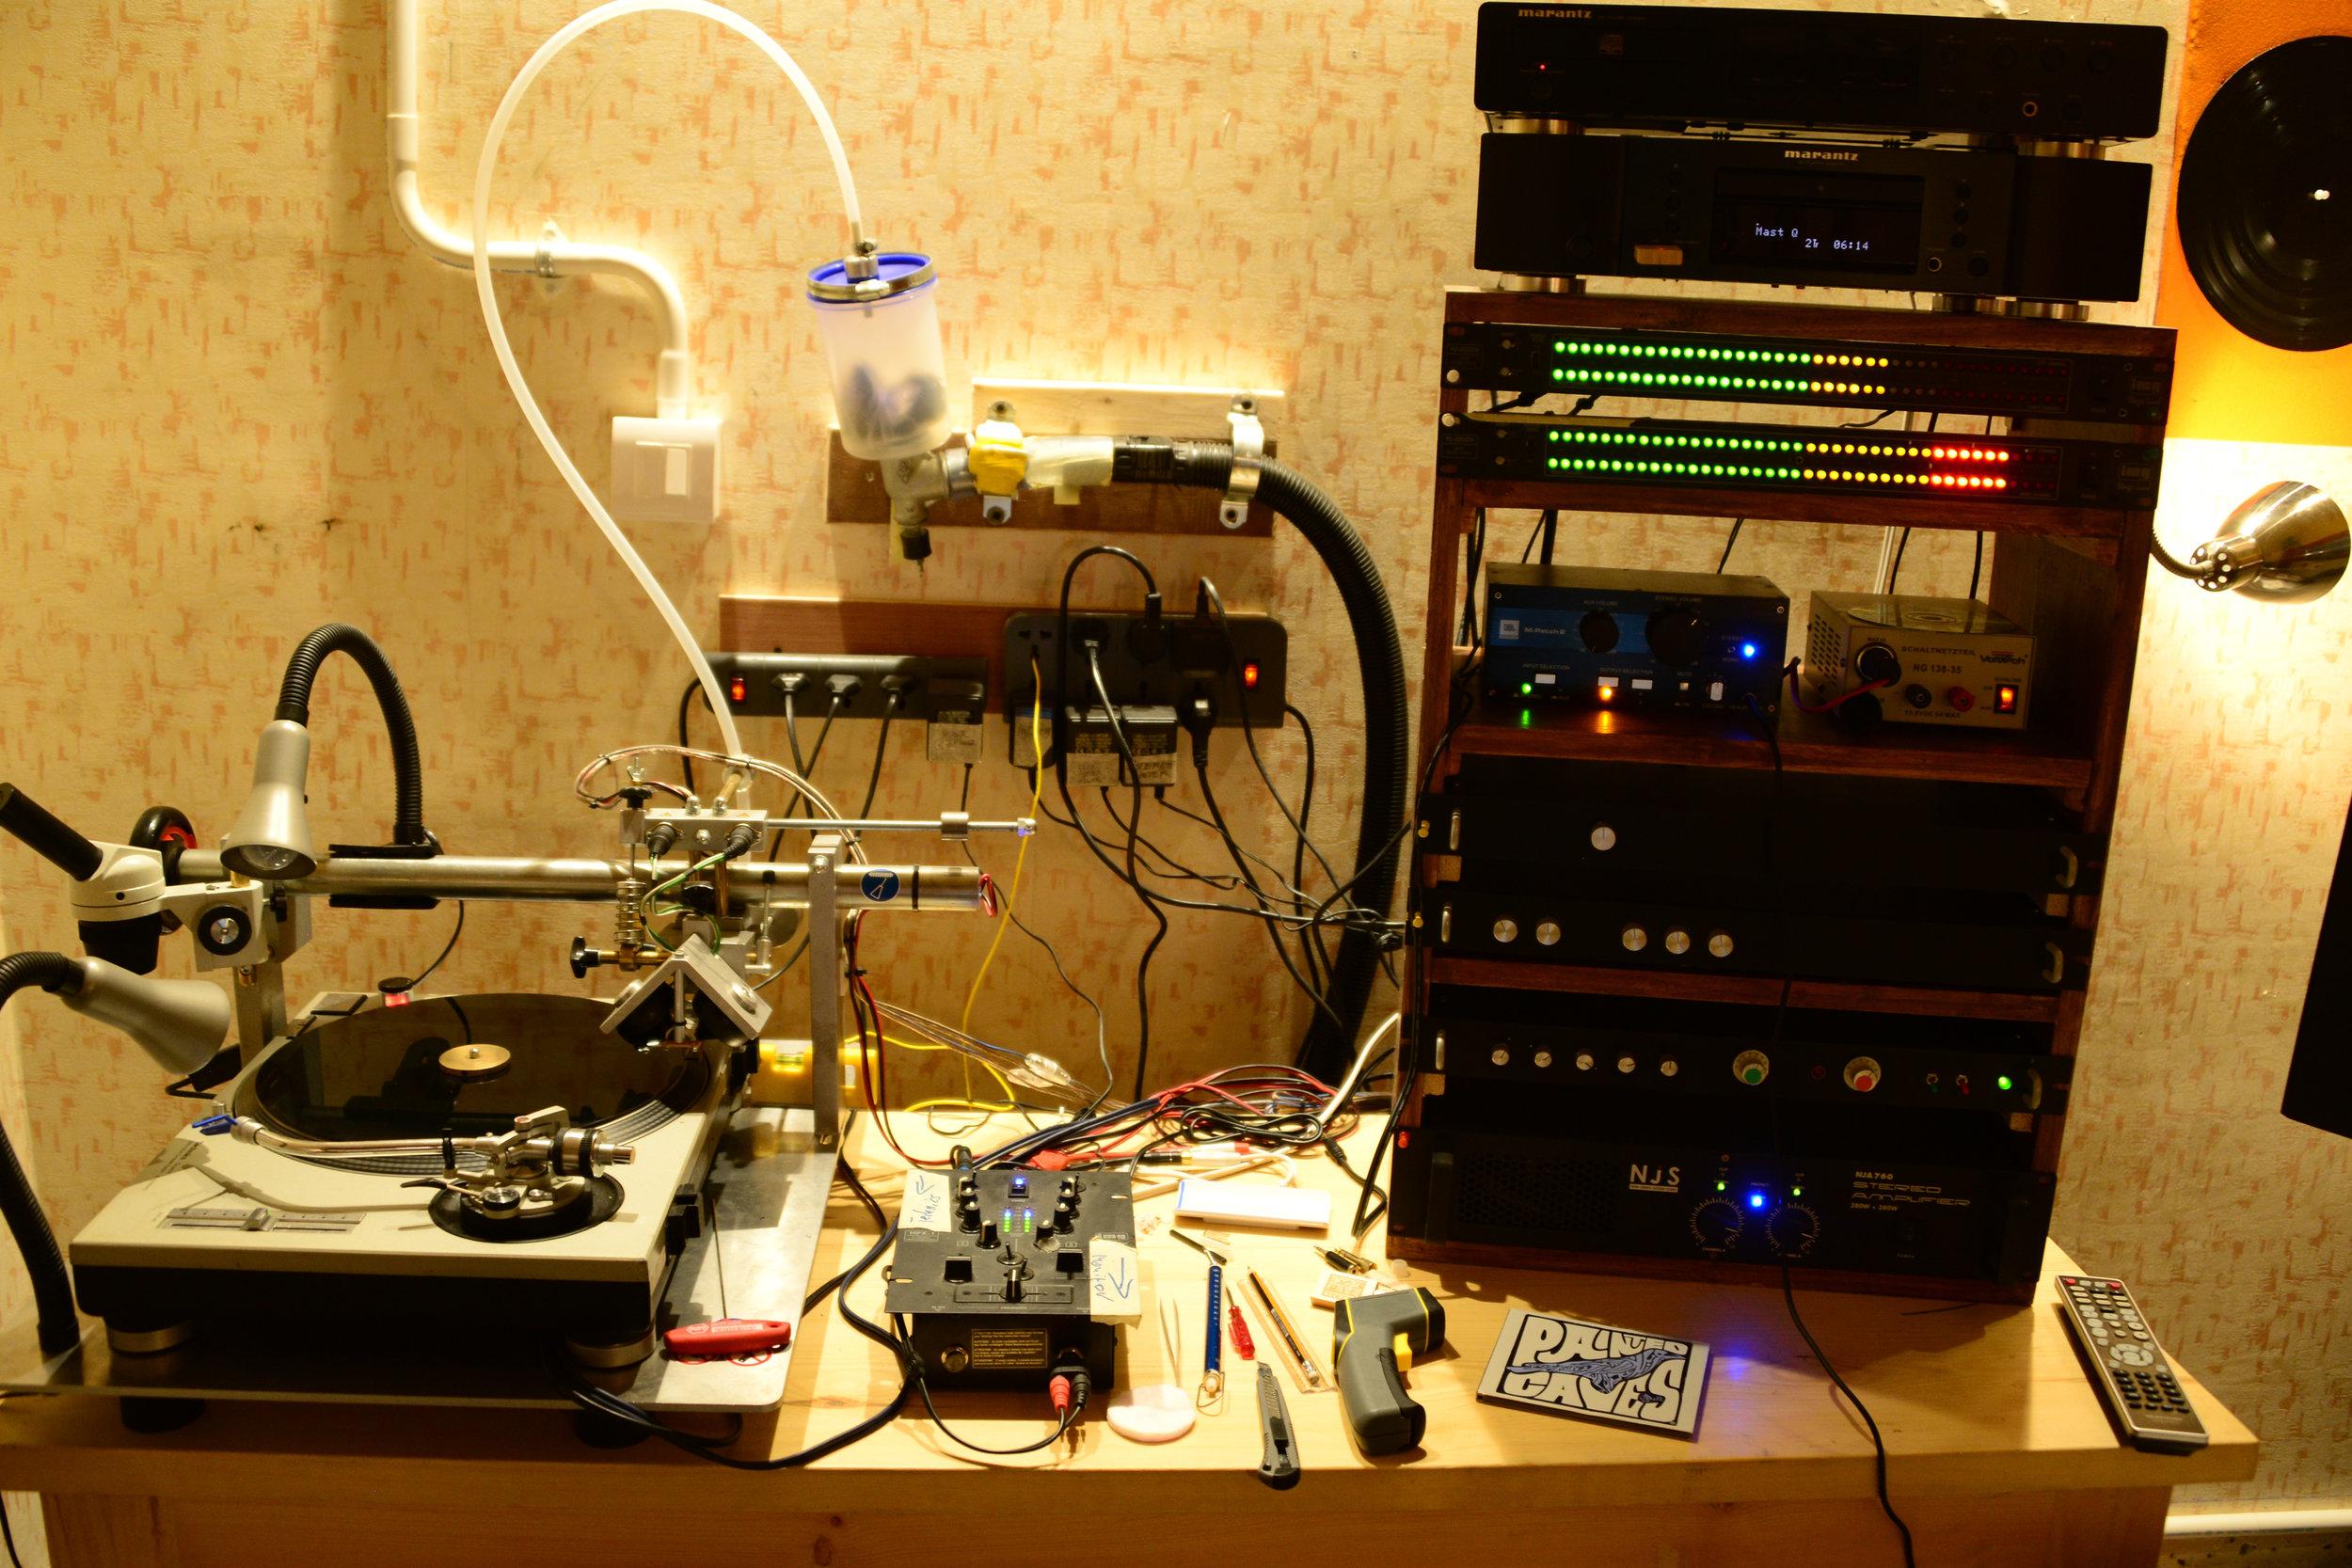 Amarrass' vinyl-cutting setup.Photo by Ankur Malhotra.